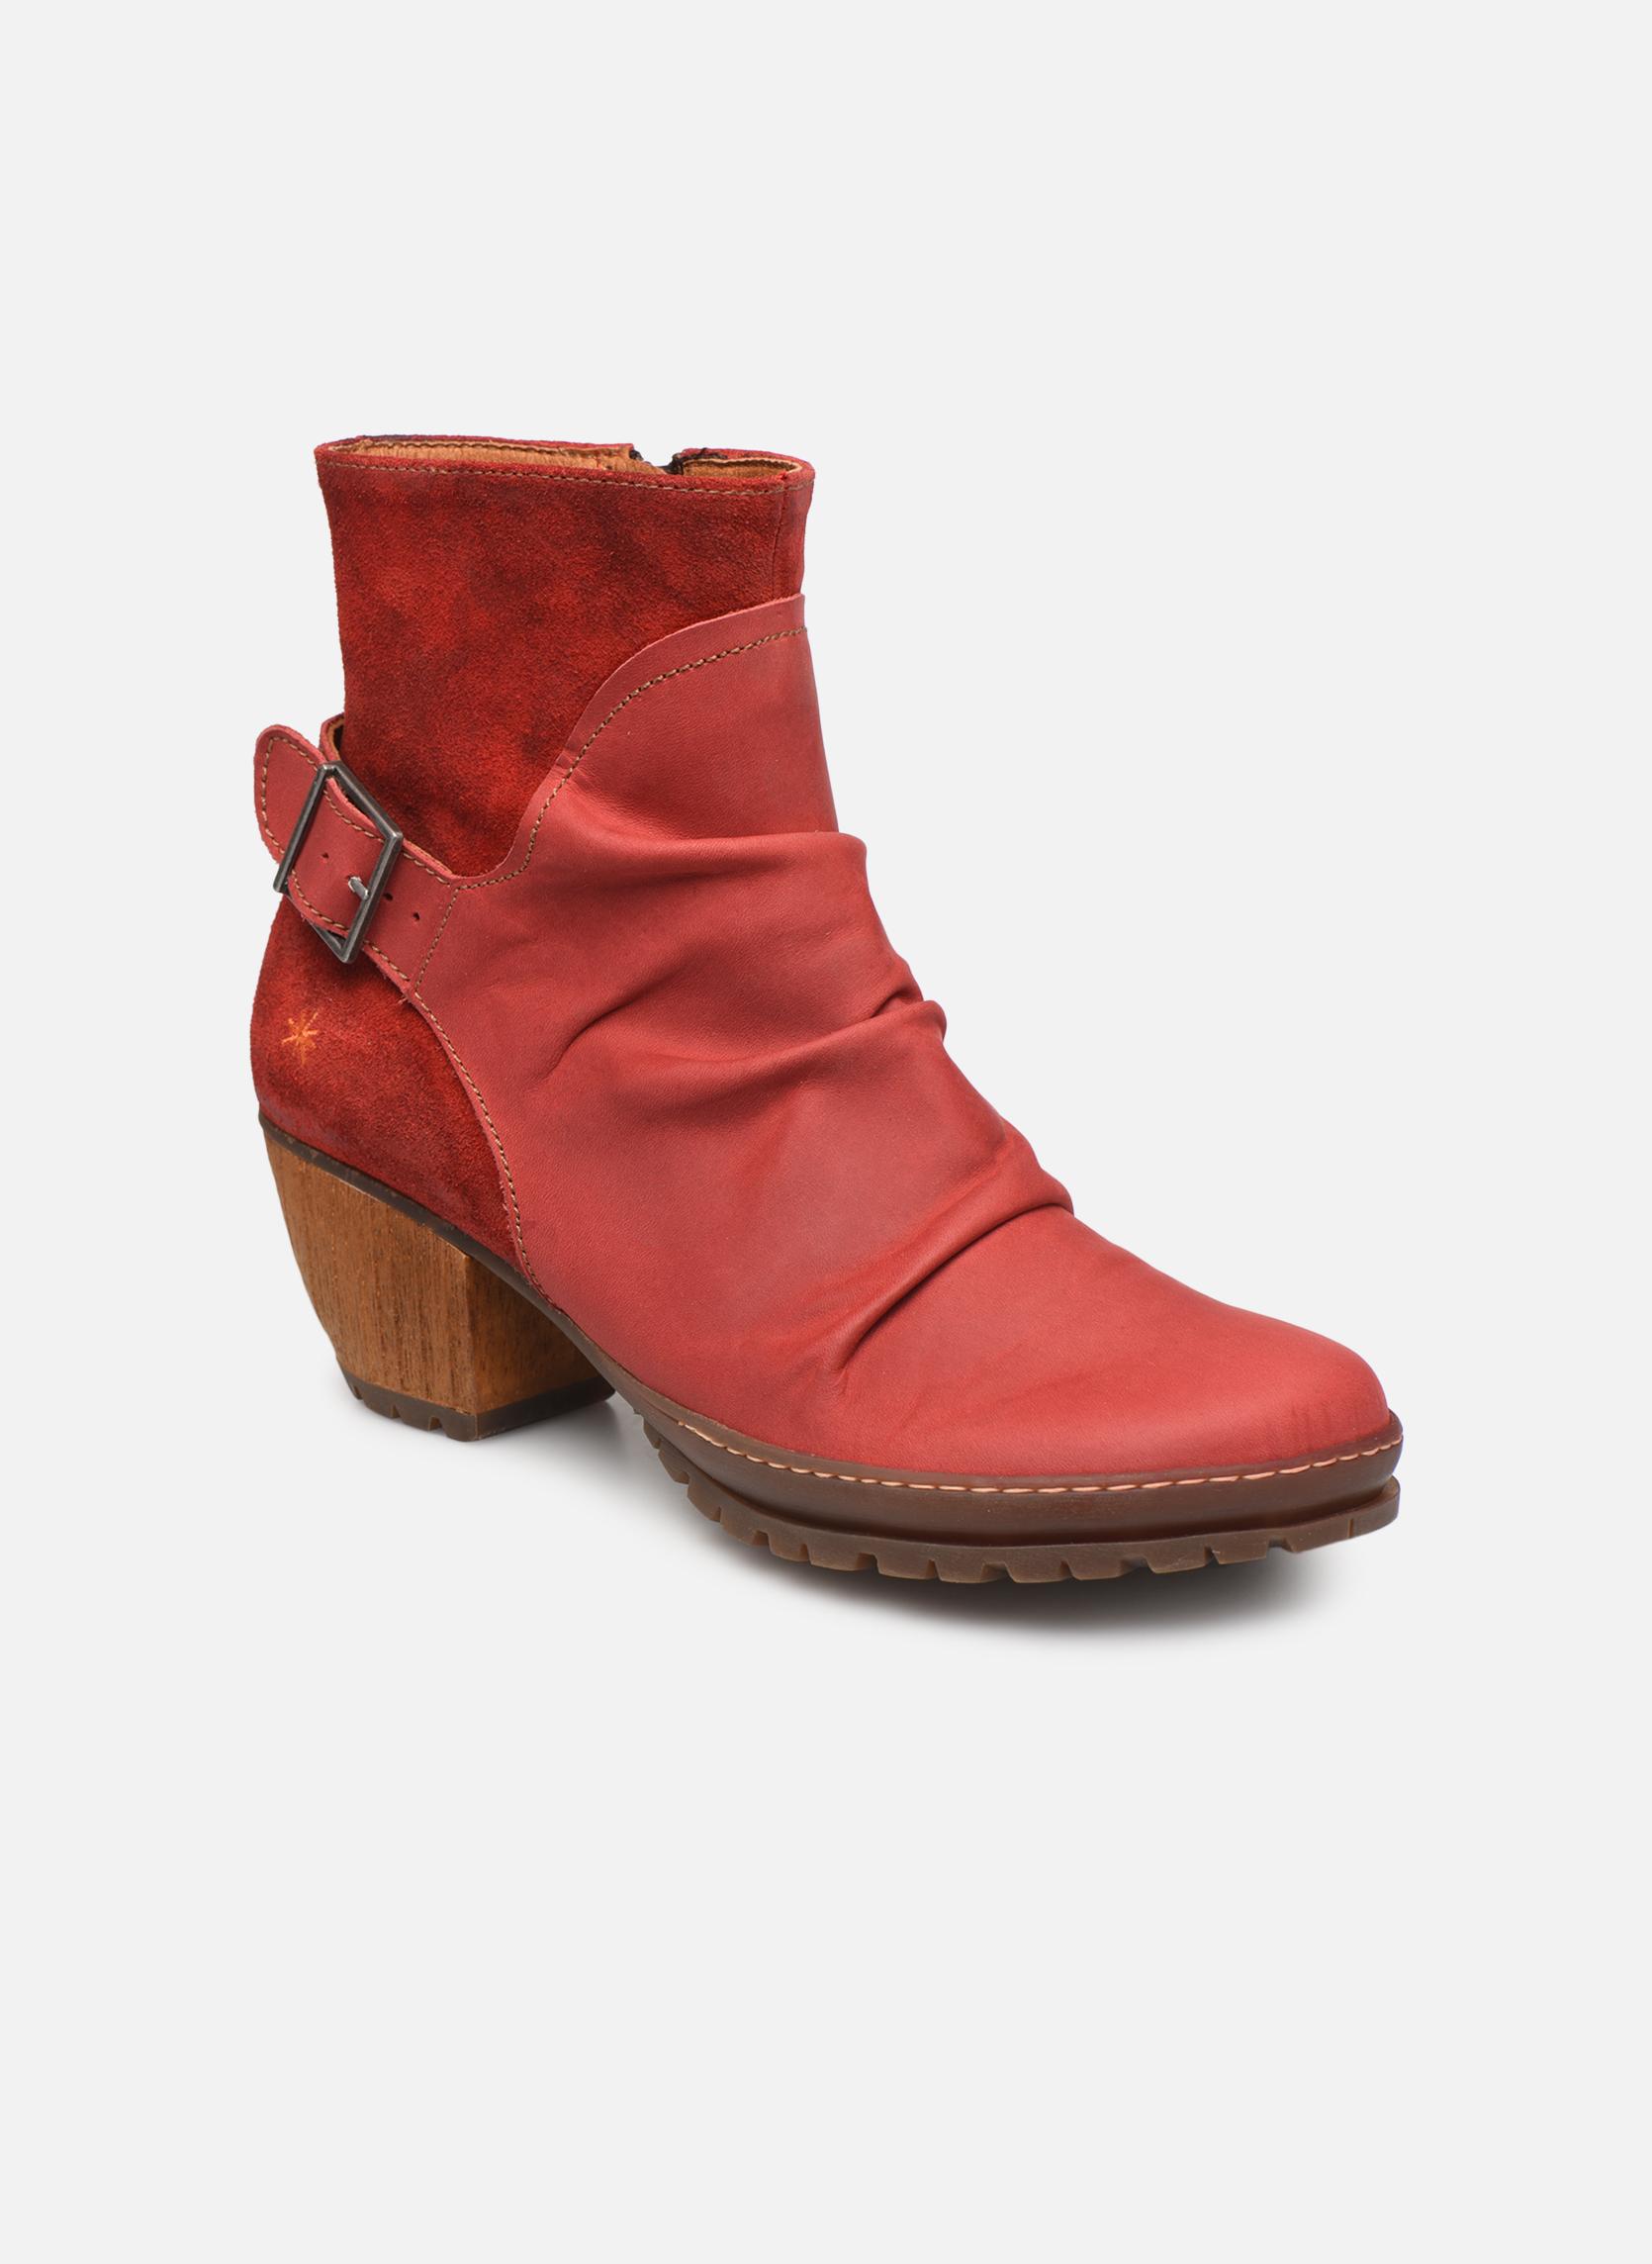 Boots en enkellaarsjes Art Rood